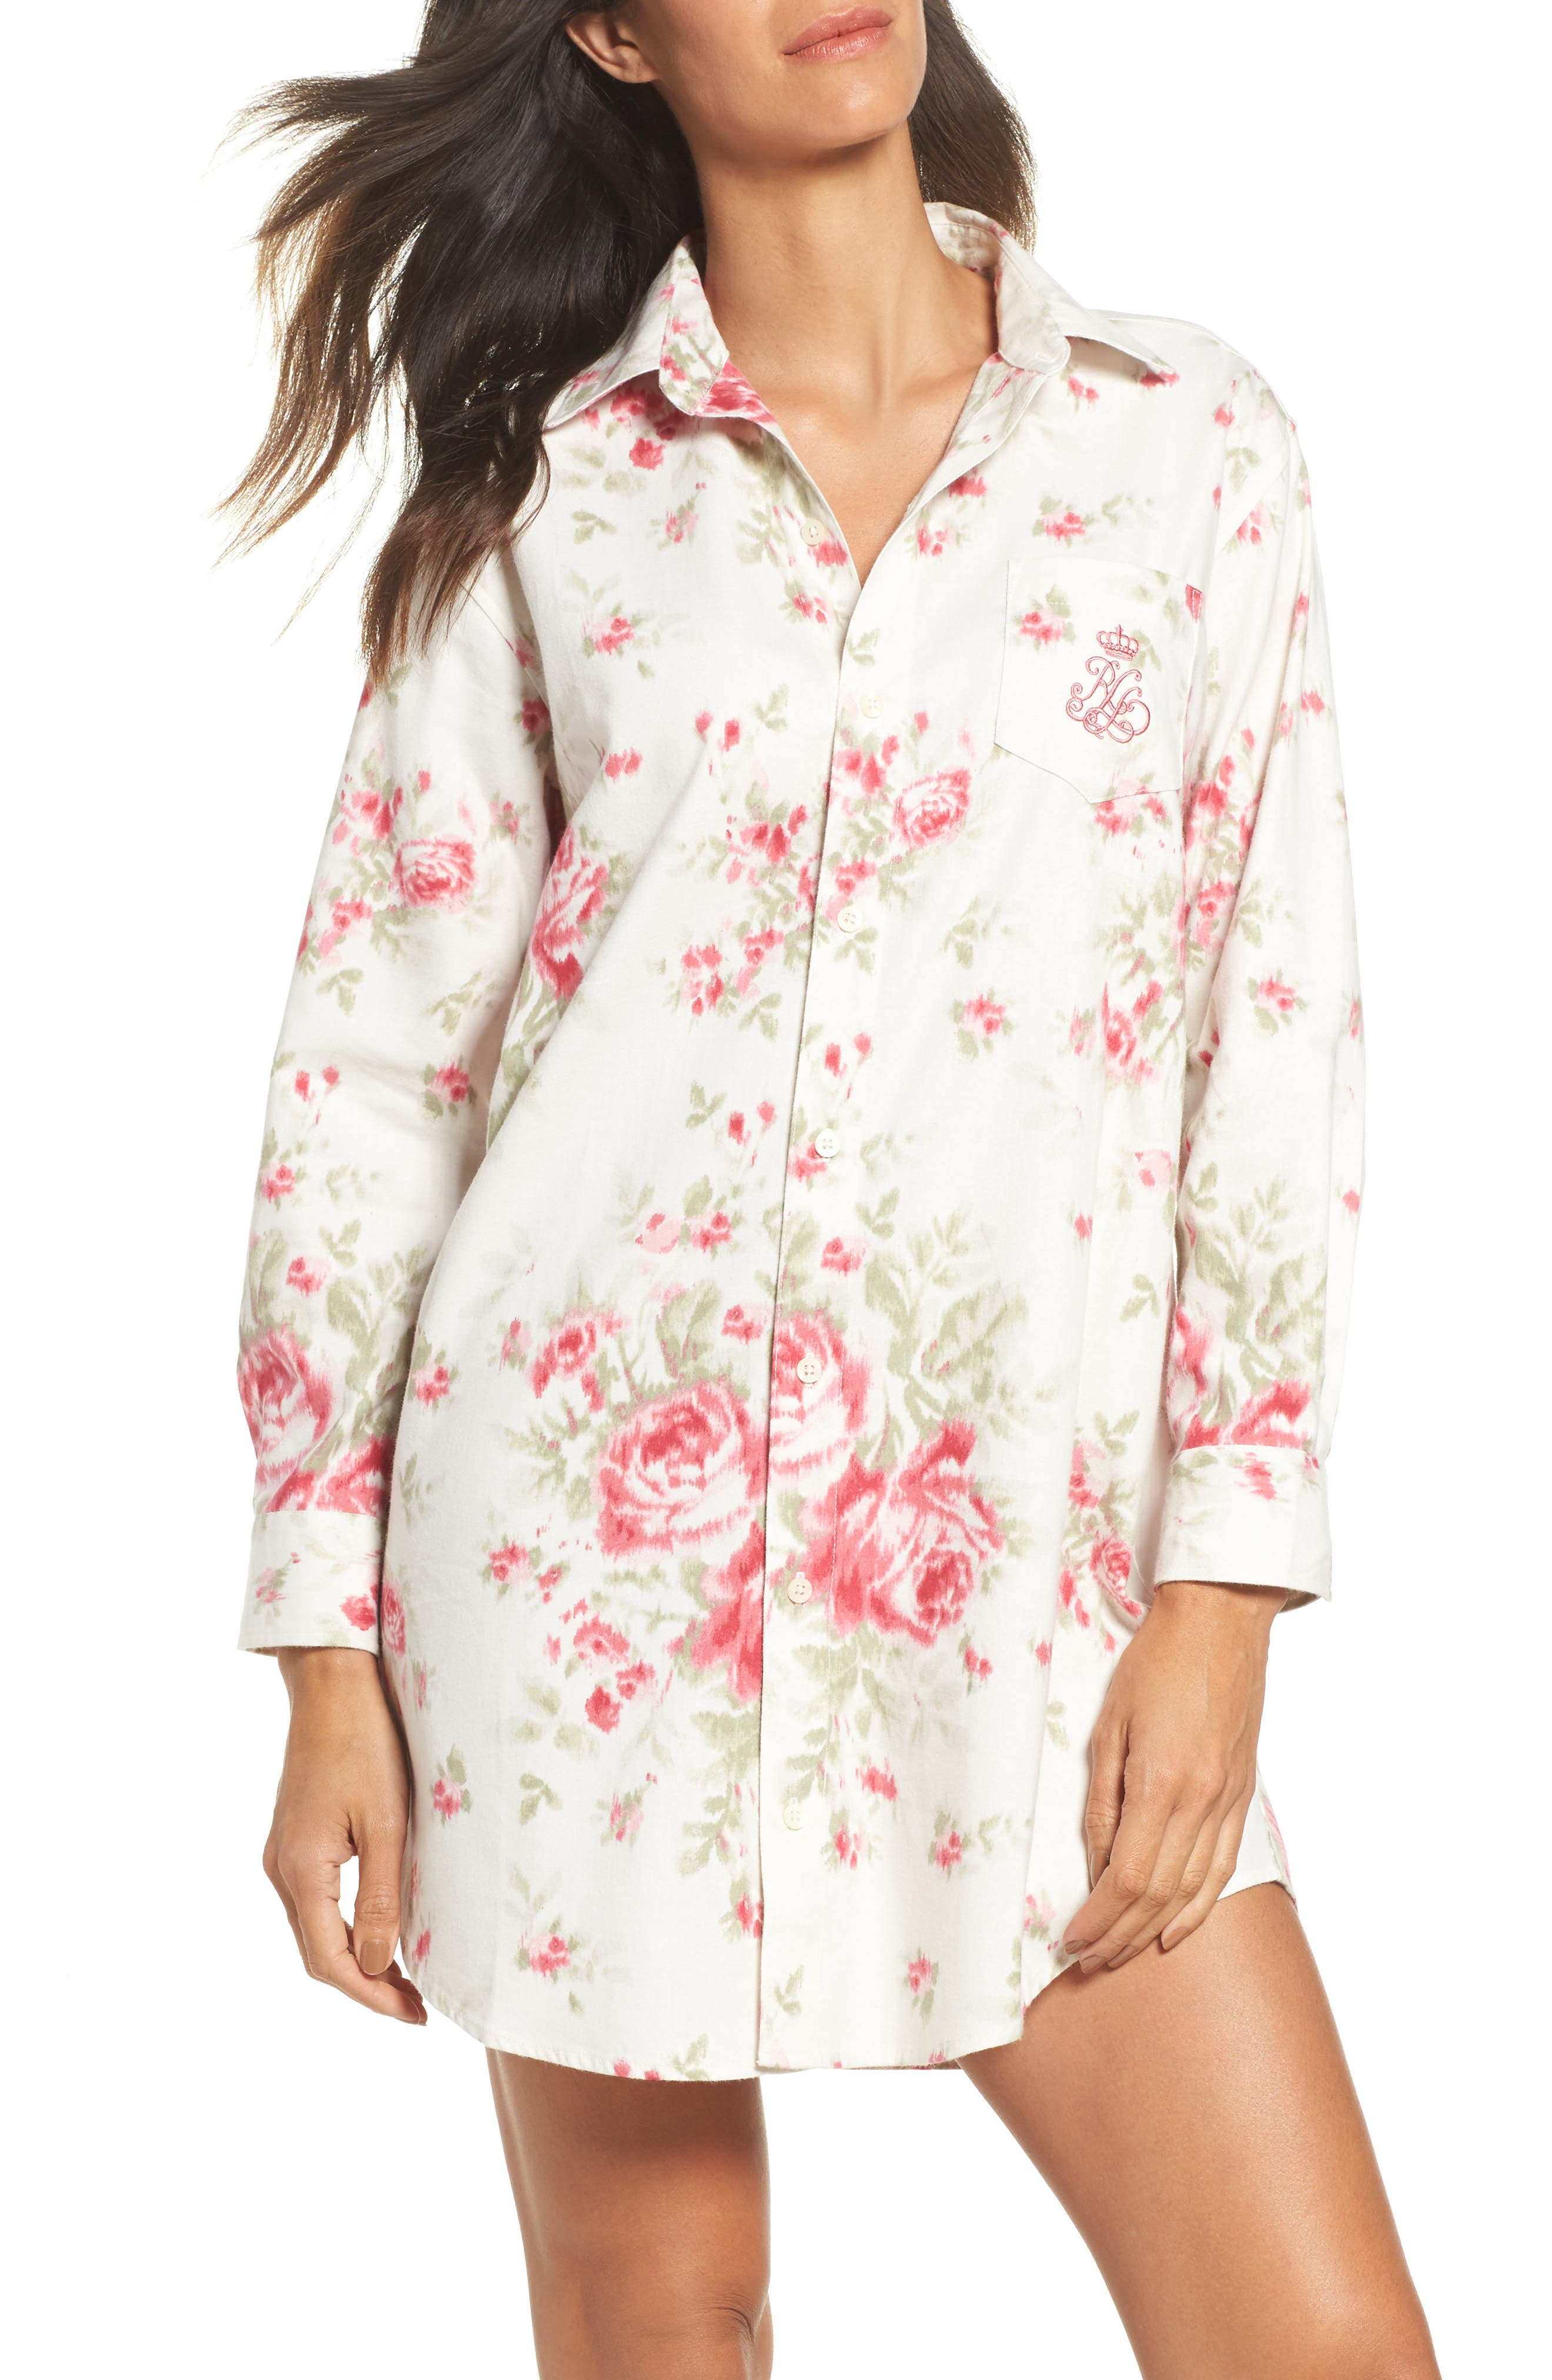 Flannel Sleep Shirt,                         Main,                         color, Big Rose Floral